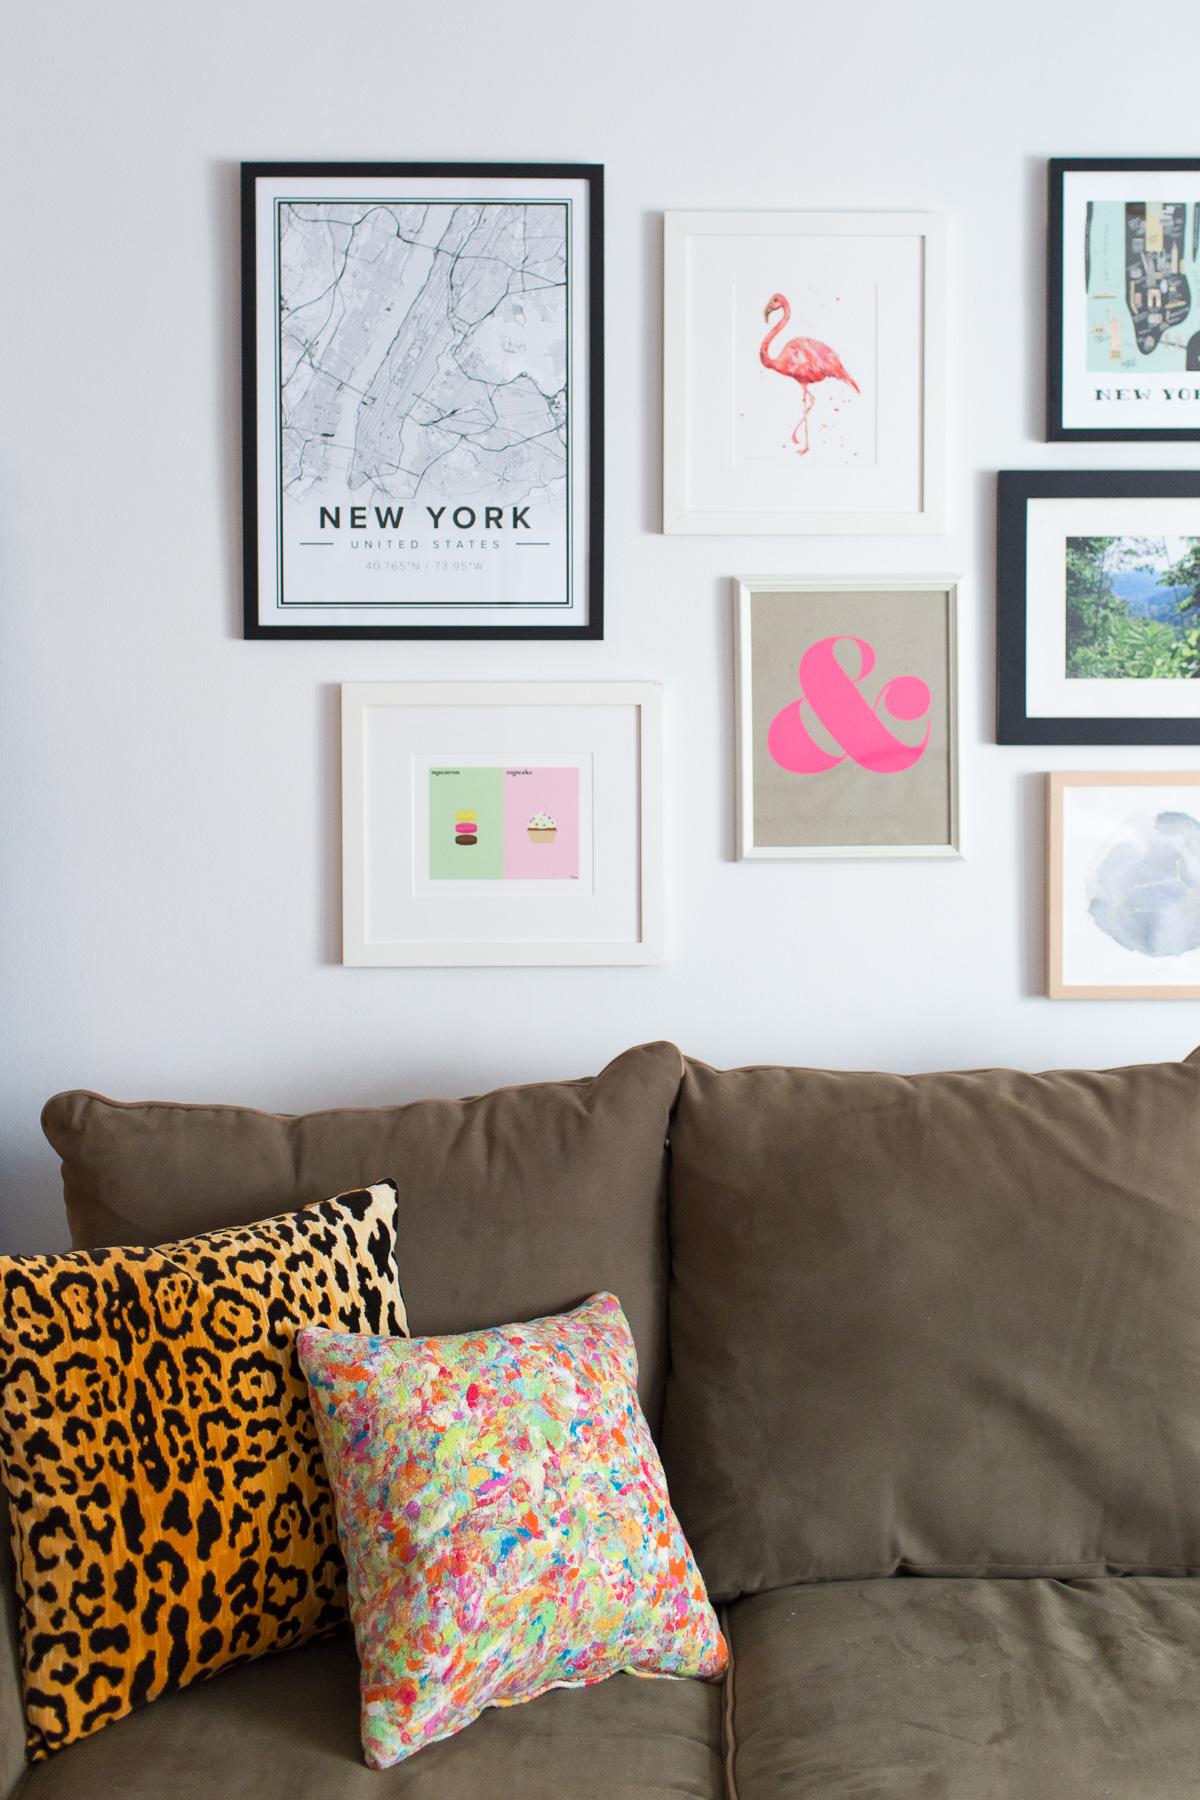 studio-apartment-gallery-wall-5417